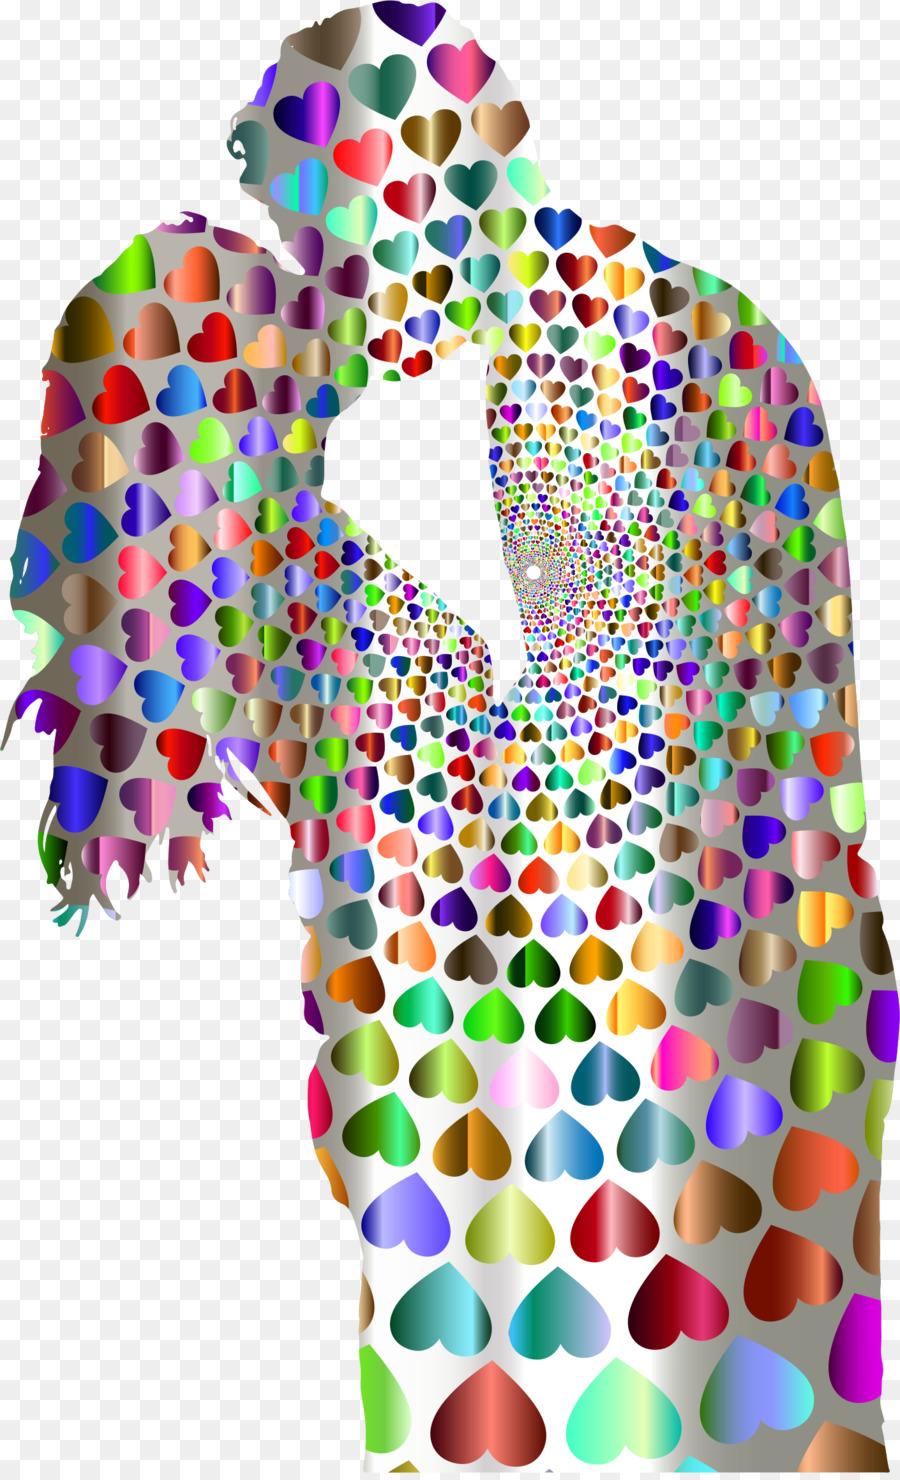 Urdu poetry clipart clipart stock Love Kiss clipart - Love, Pattern, Design, transparent clip art clipart stock